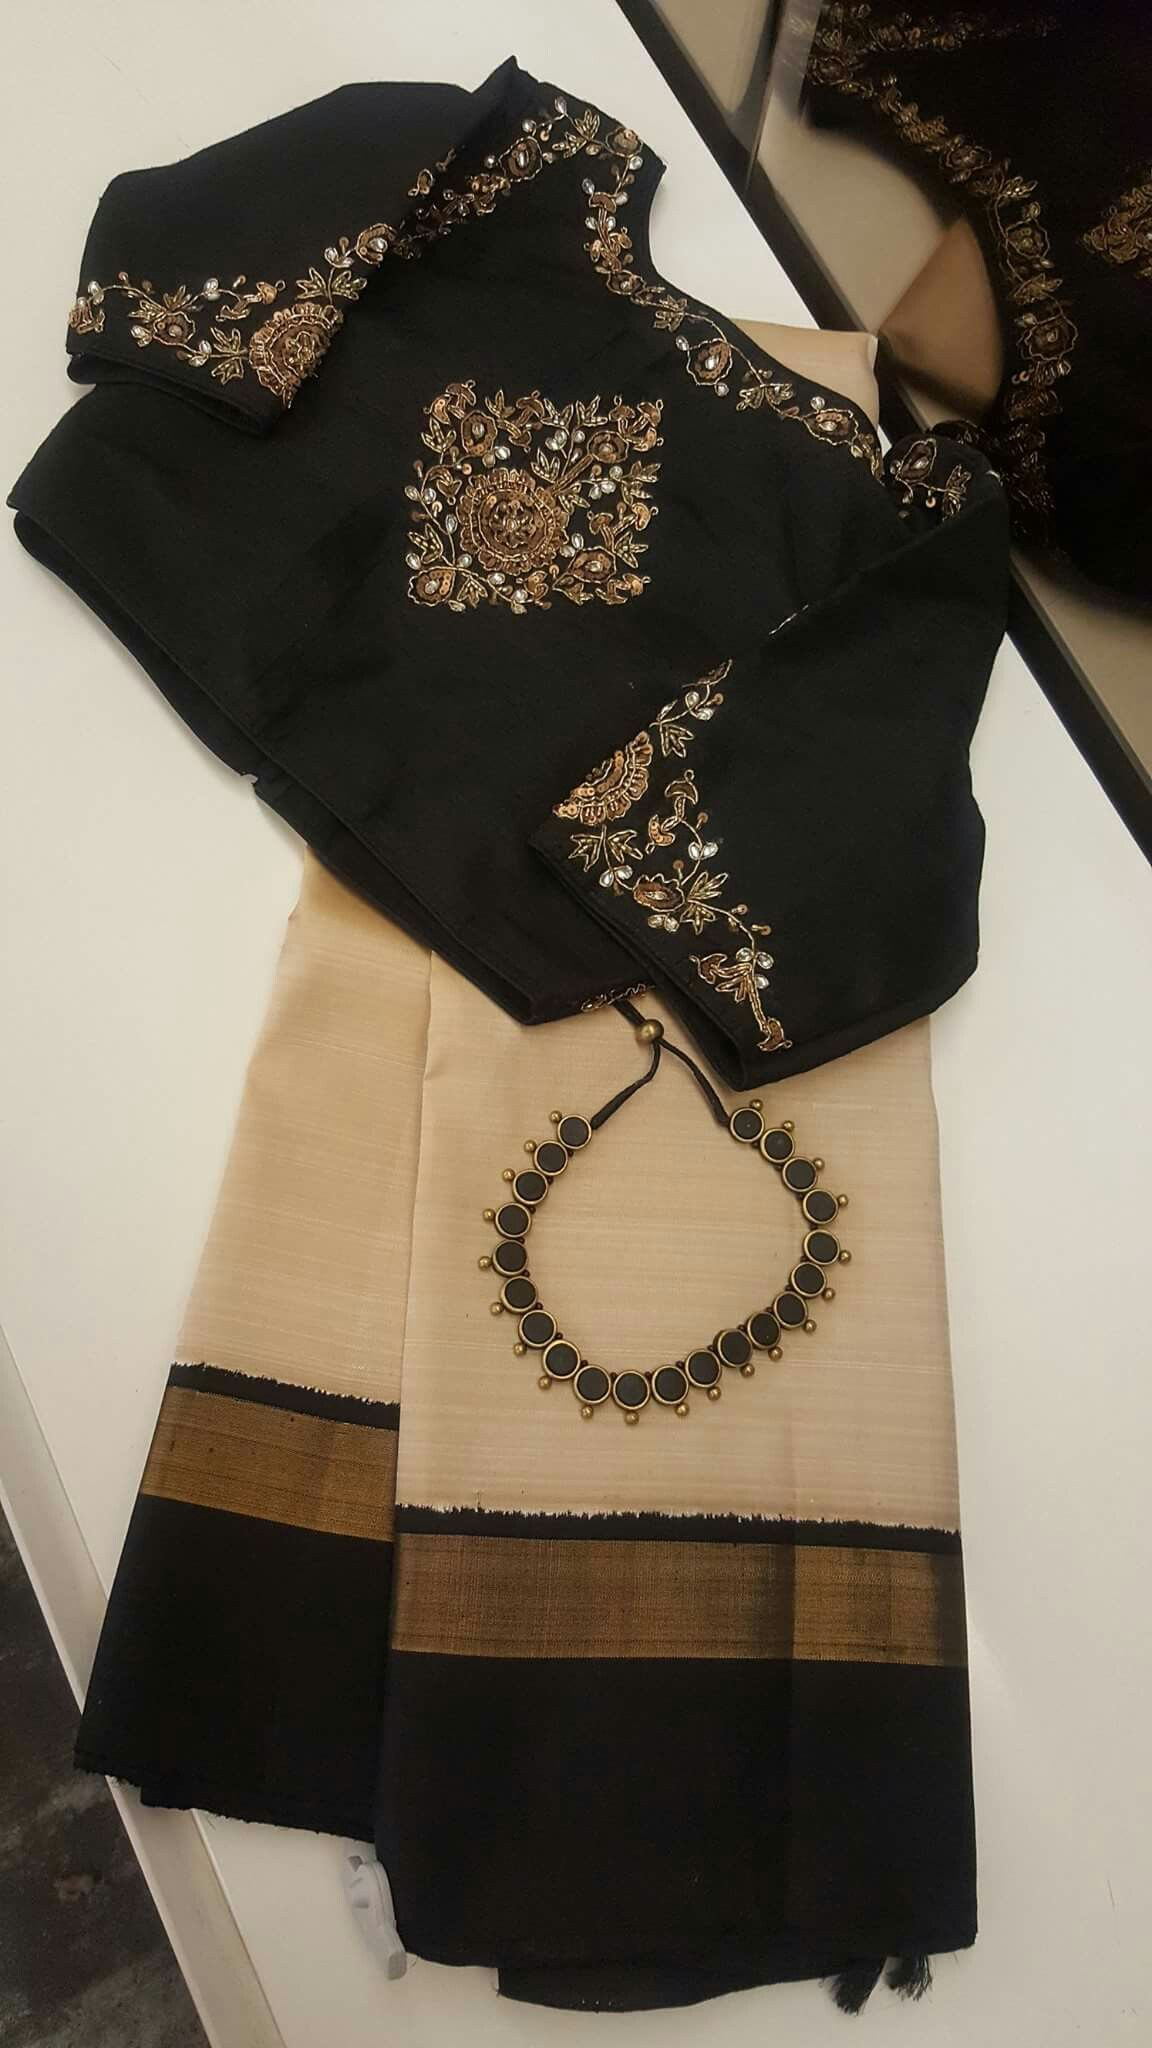 Saree blouse design for cotton saree pin by apoorva dev on blouses  pinterest  saree blouse designs